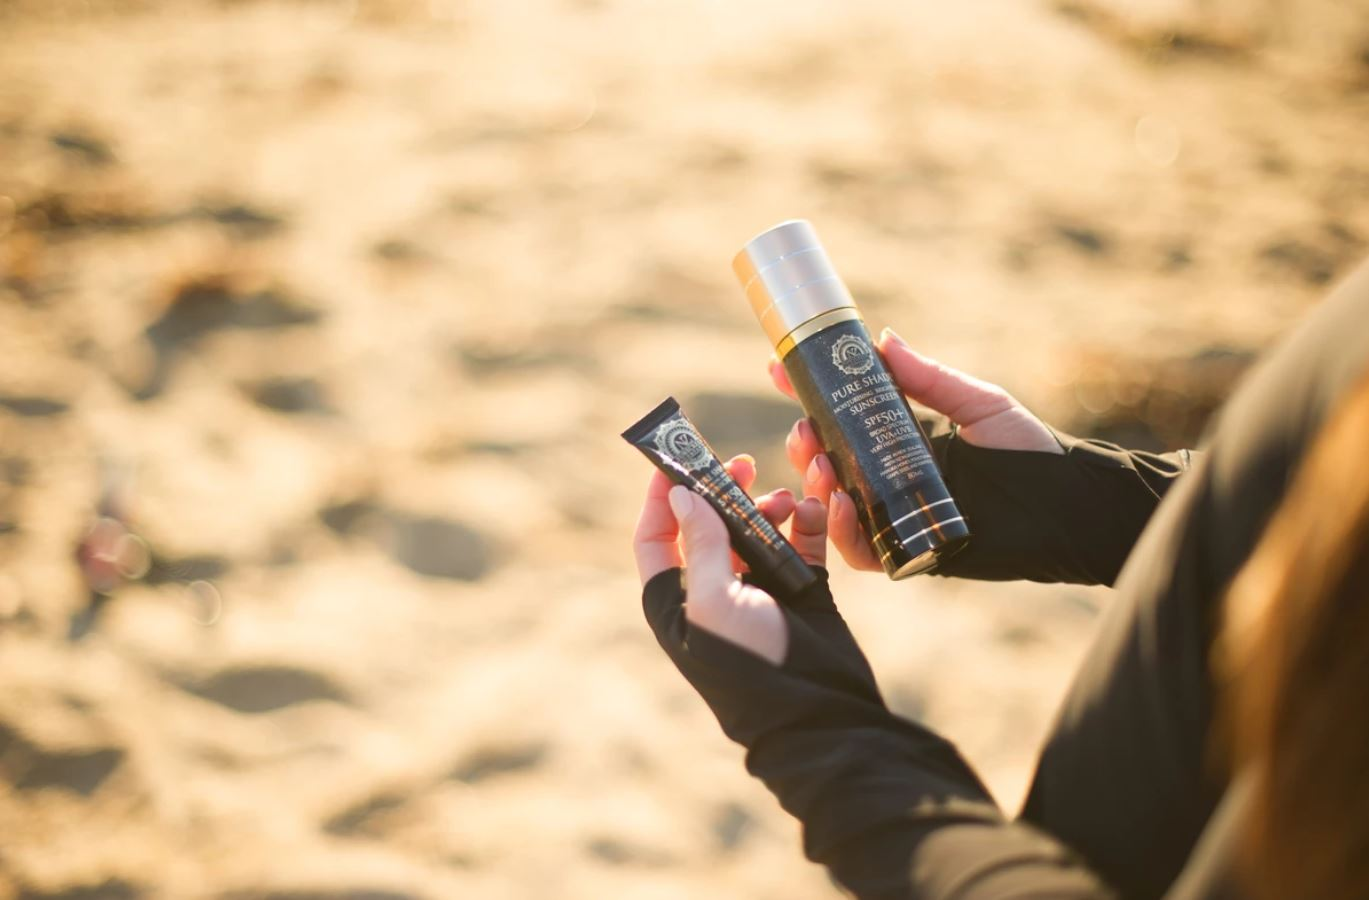 kem chống nắng 4 in 1 Pure Shade SPF 50+ Moisturising & Sunscreen 1